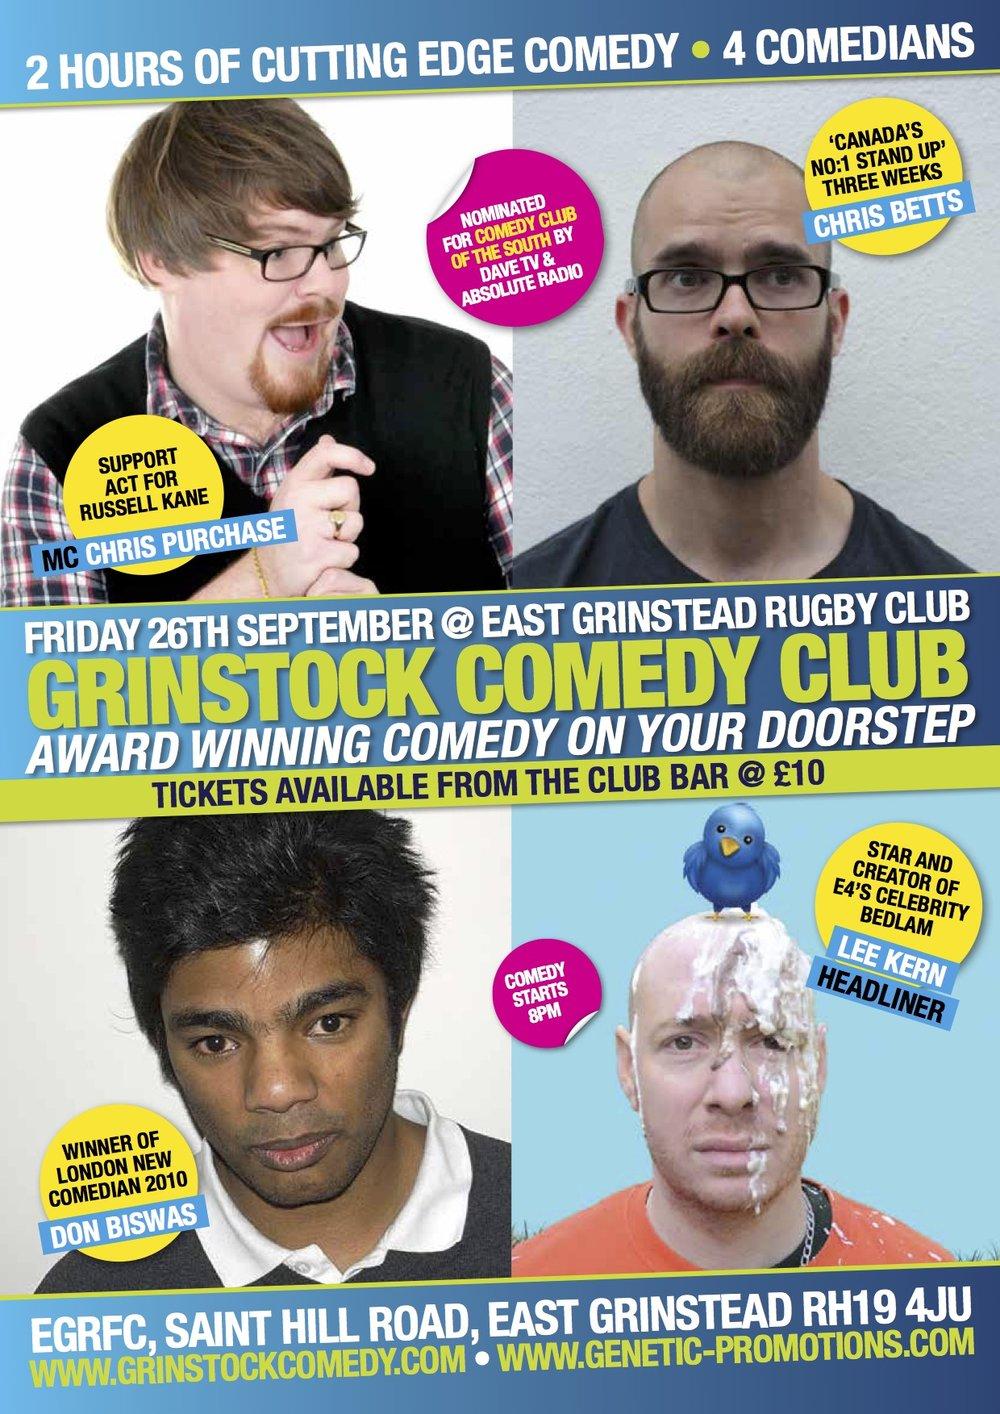 grinstock-comdey-september-2014.jpg